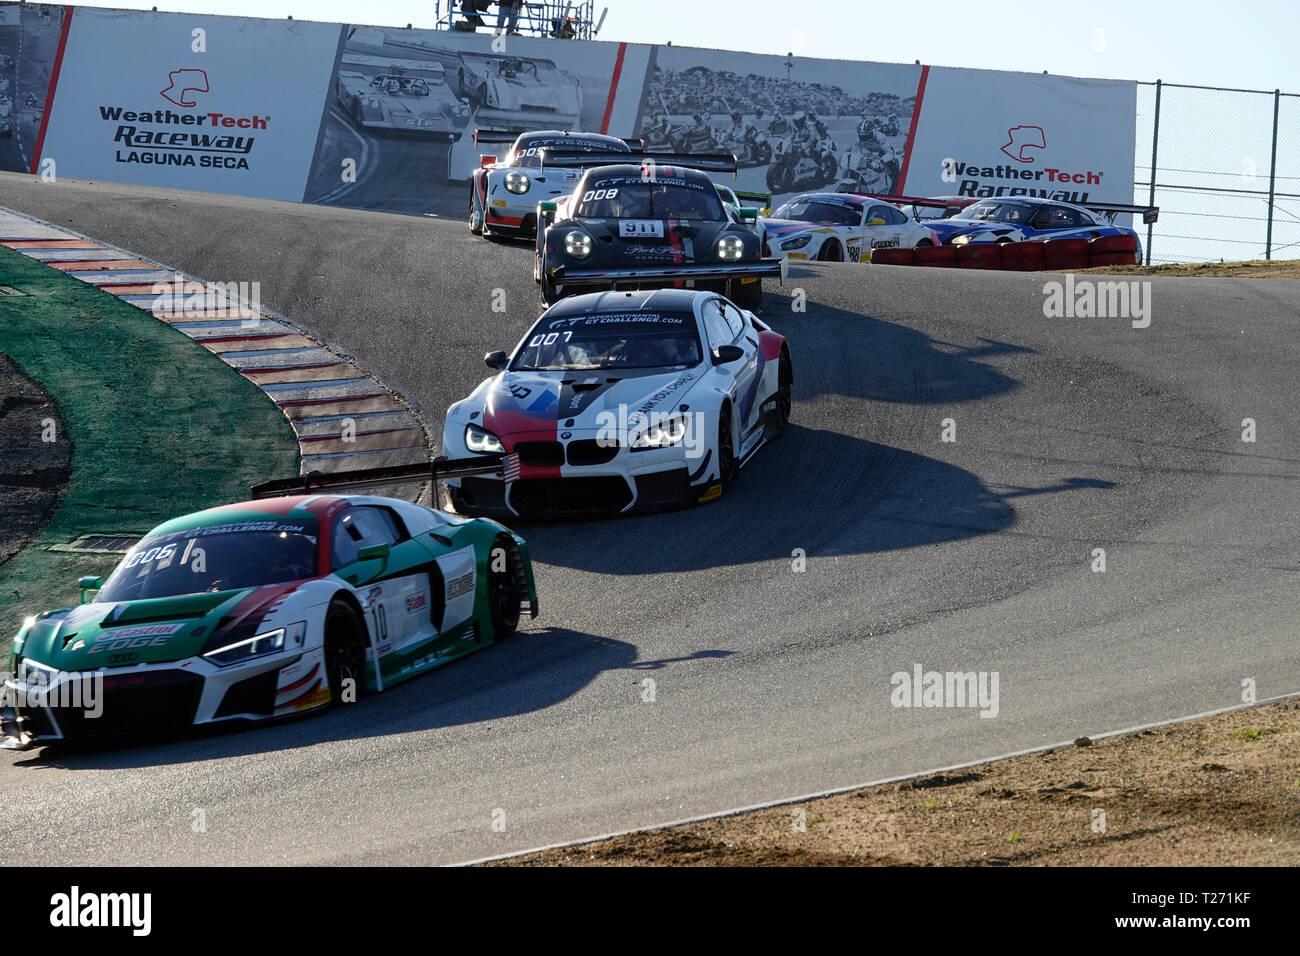 Laguna Seca Raceway >> Laguna Seca Raceway Monterey Usa 30th March 2019